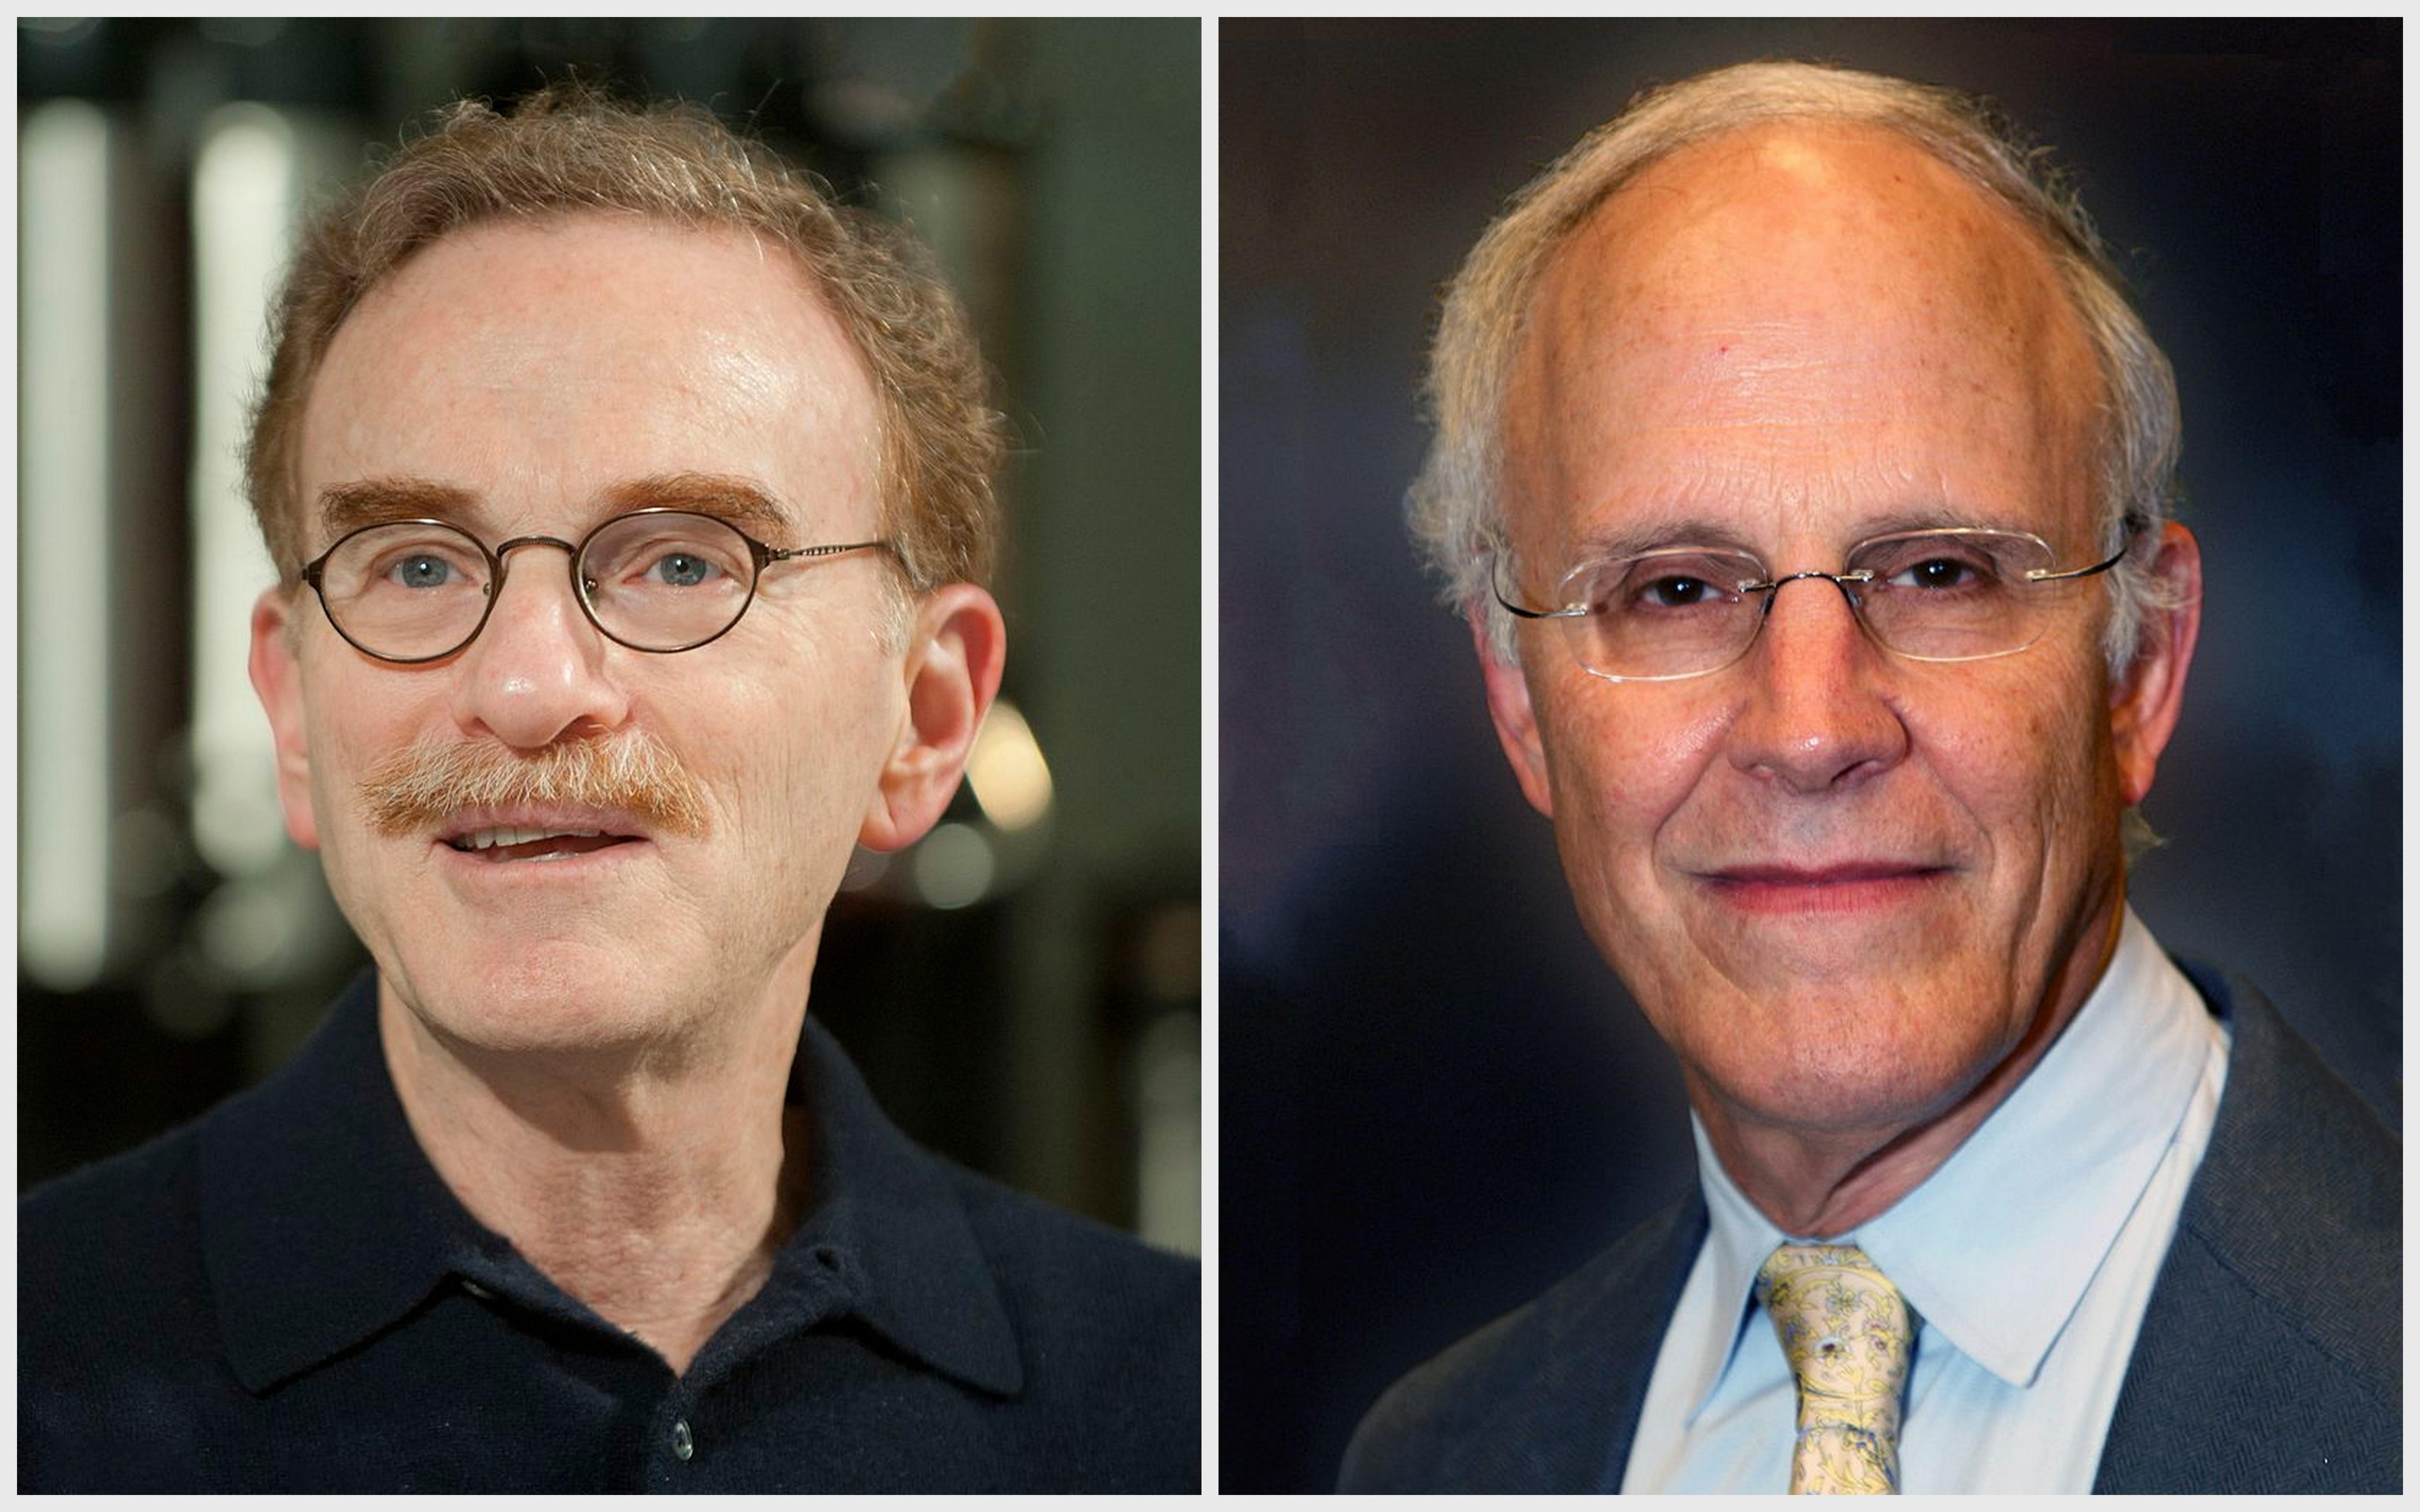 Nobel laureates Randy Schekman (left) and David Gross. Credit: James Kegley/Wikimedia Commons, CC BY-SA 3.0 (Schekman); Public domain (Gross)